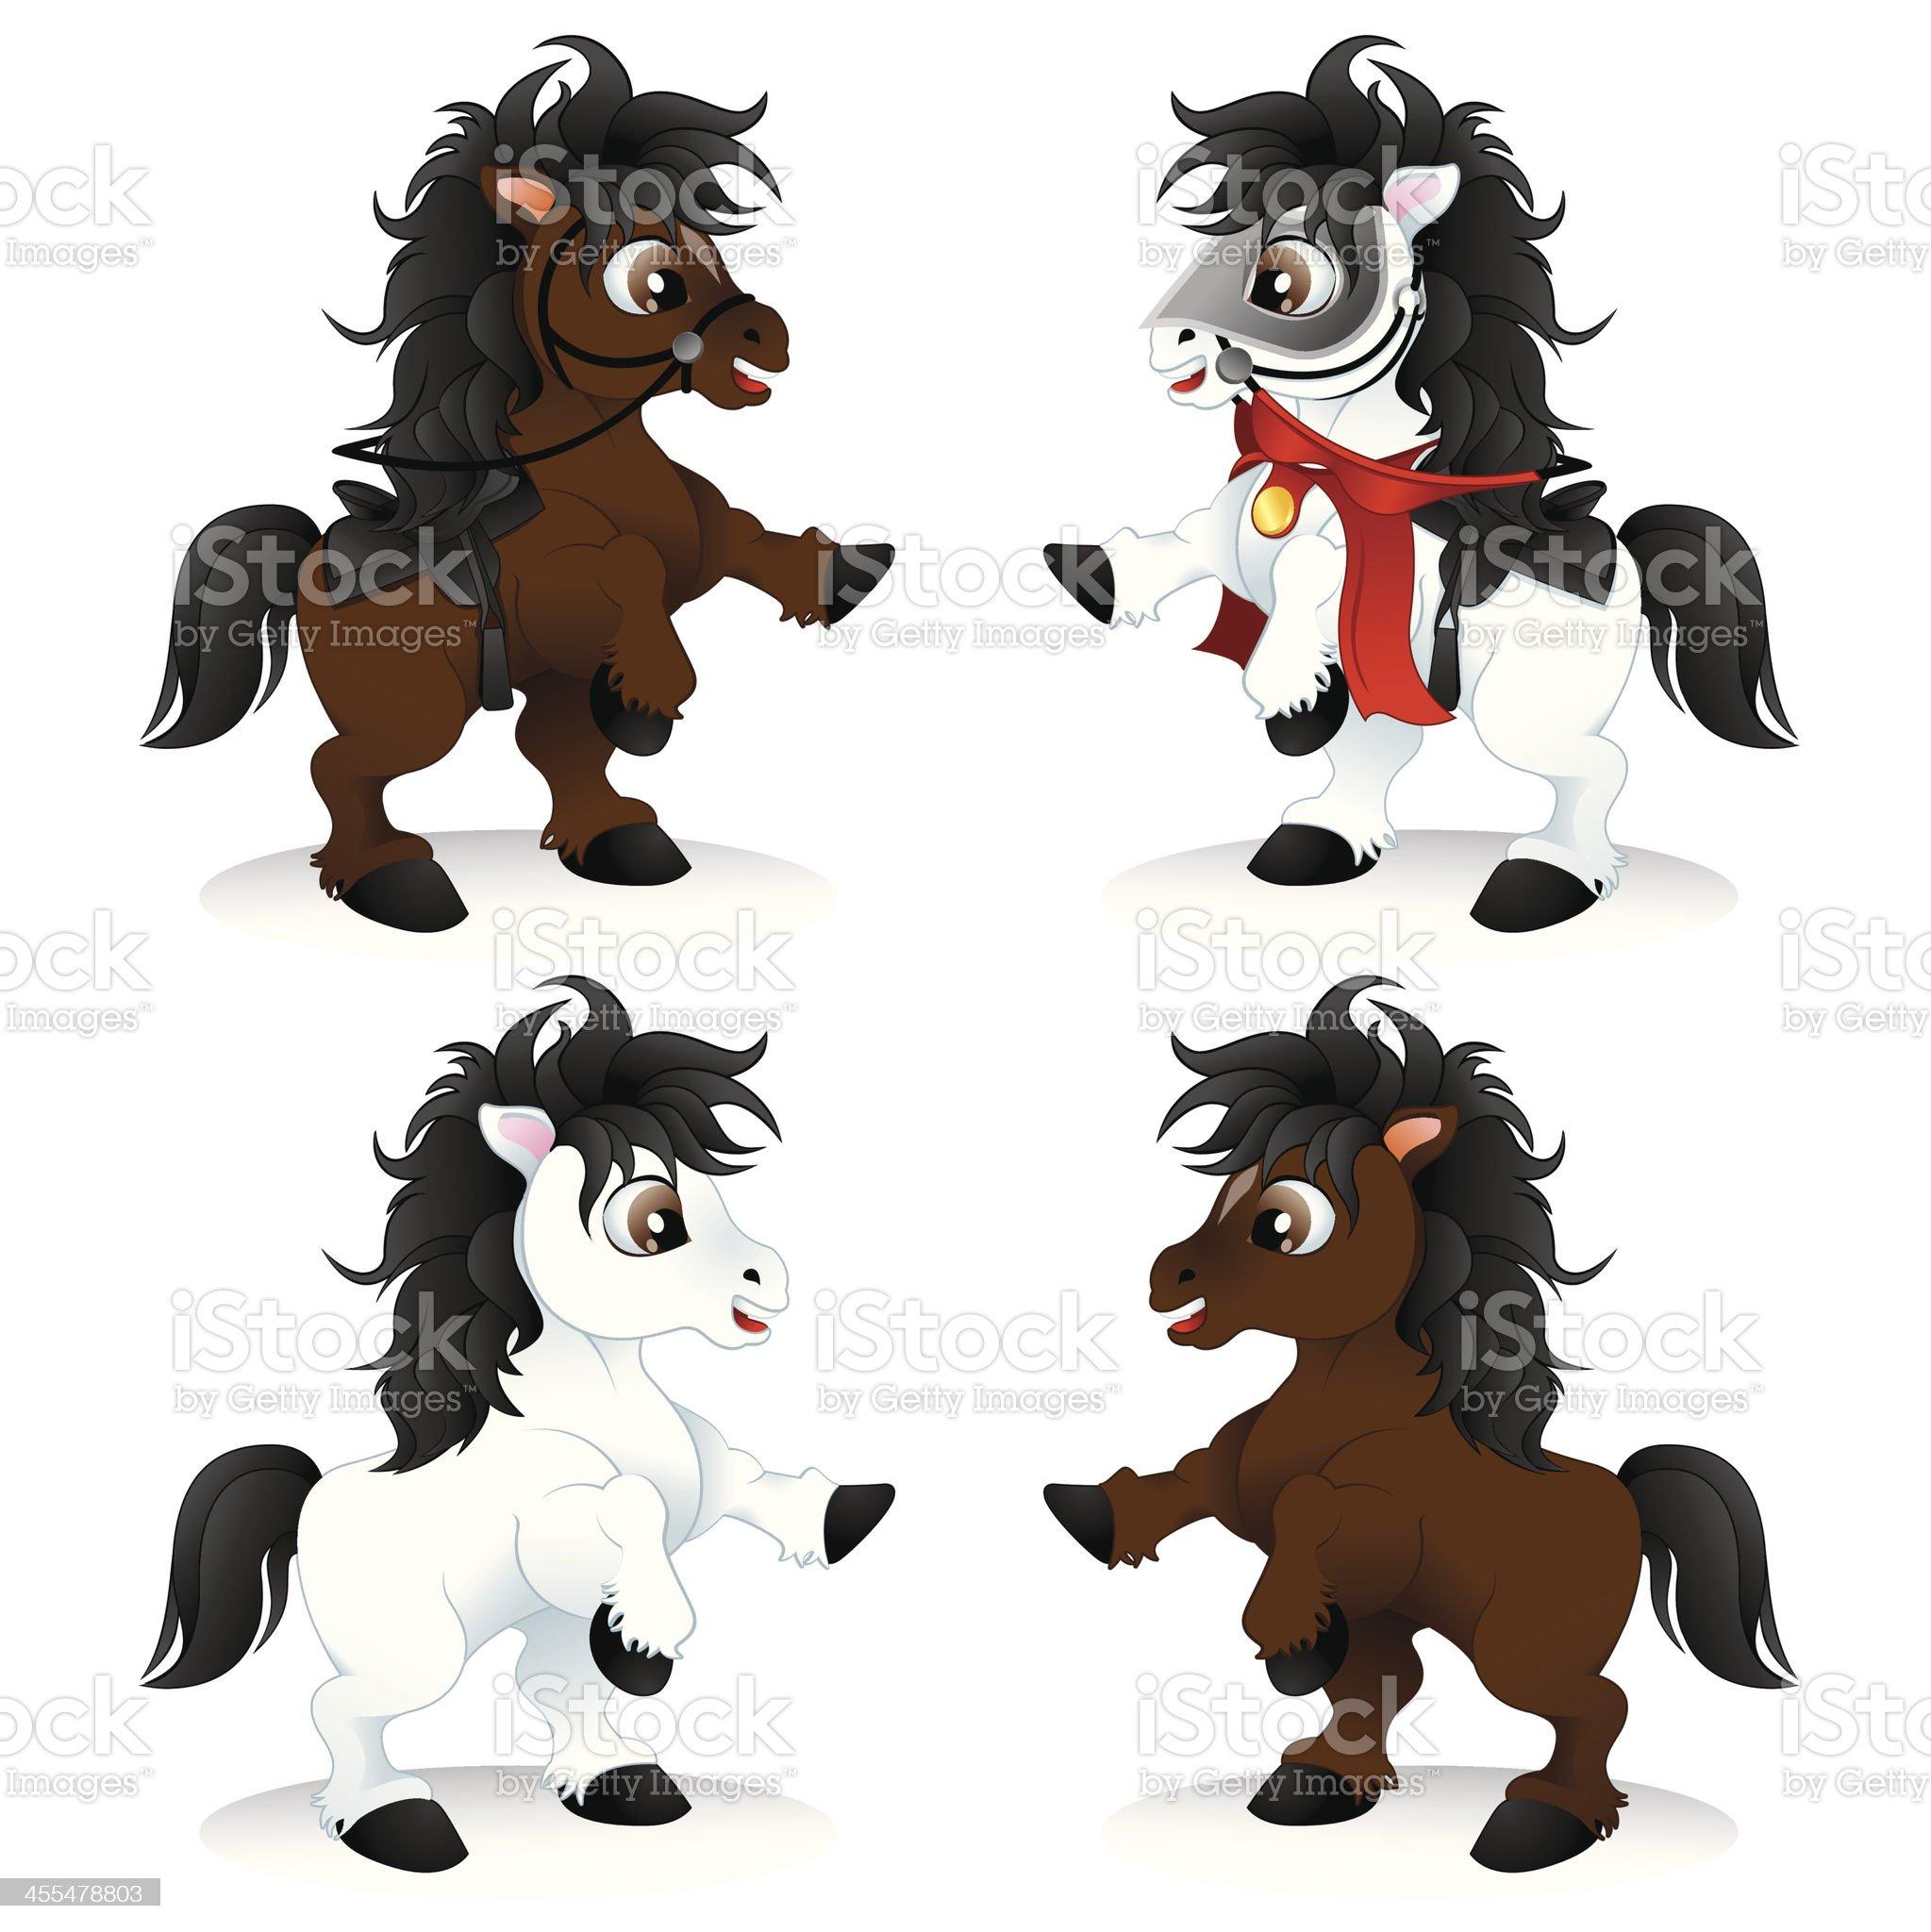 Playful Horses royalty-free stock vector art